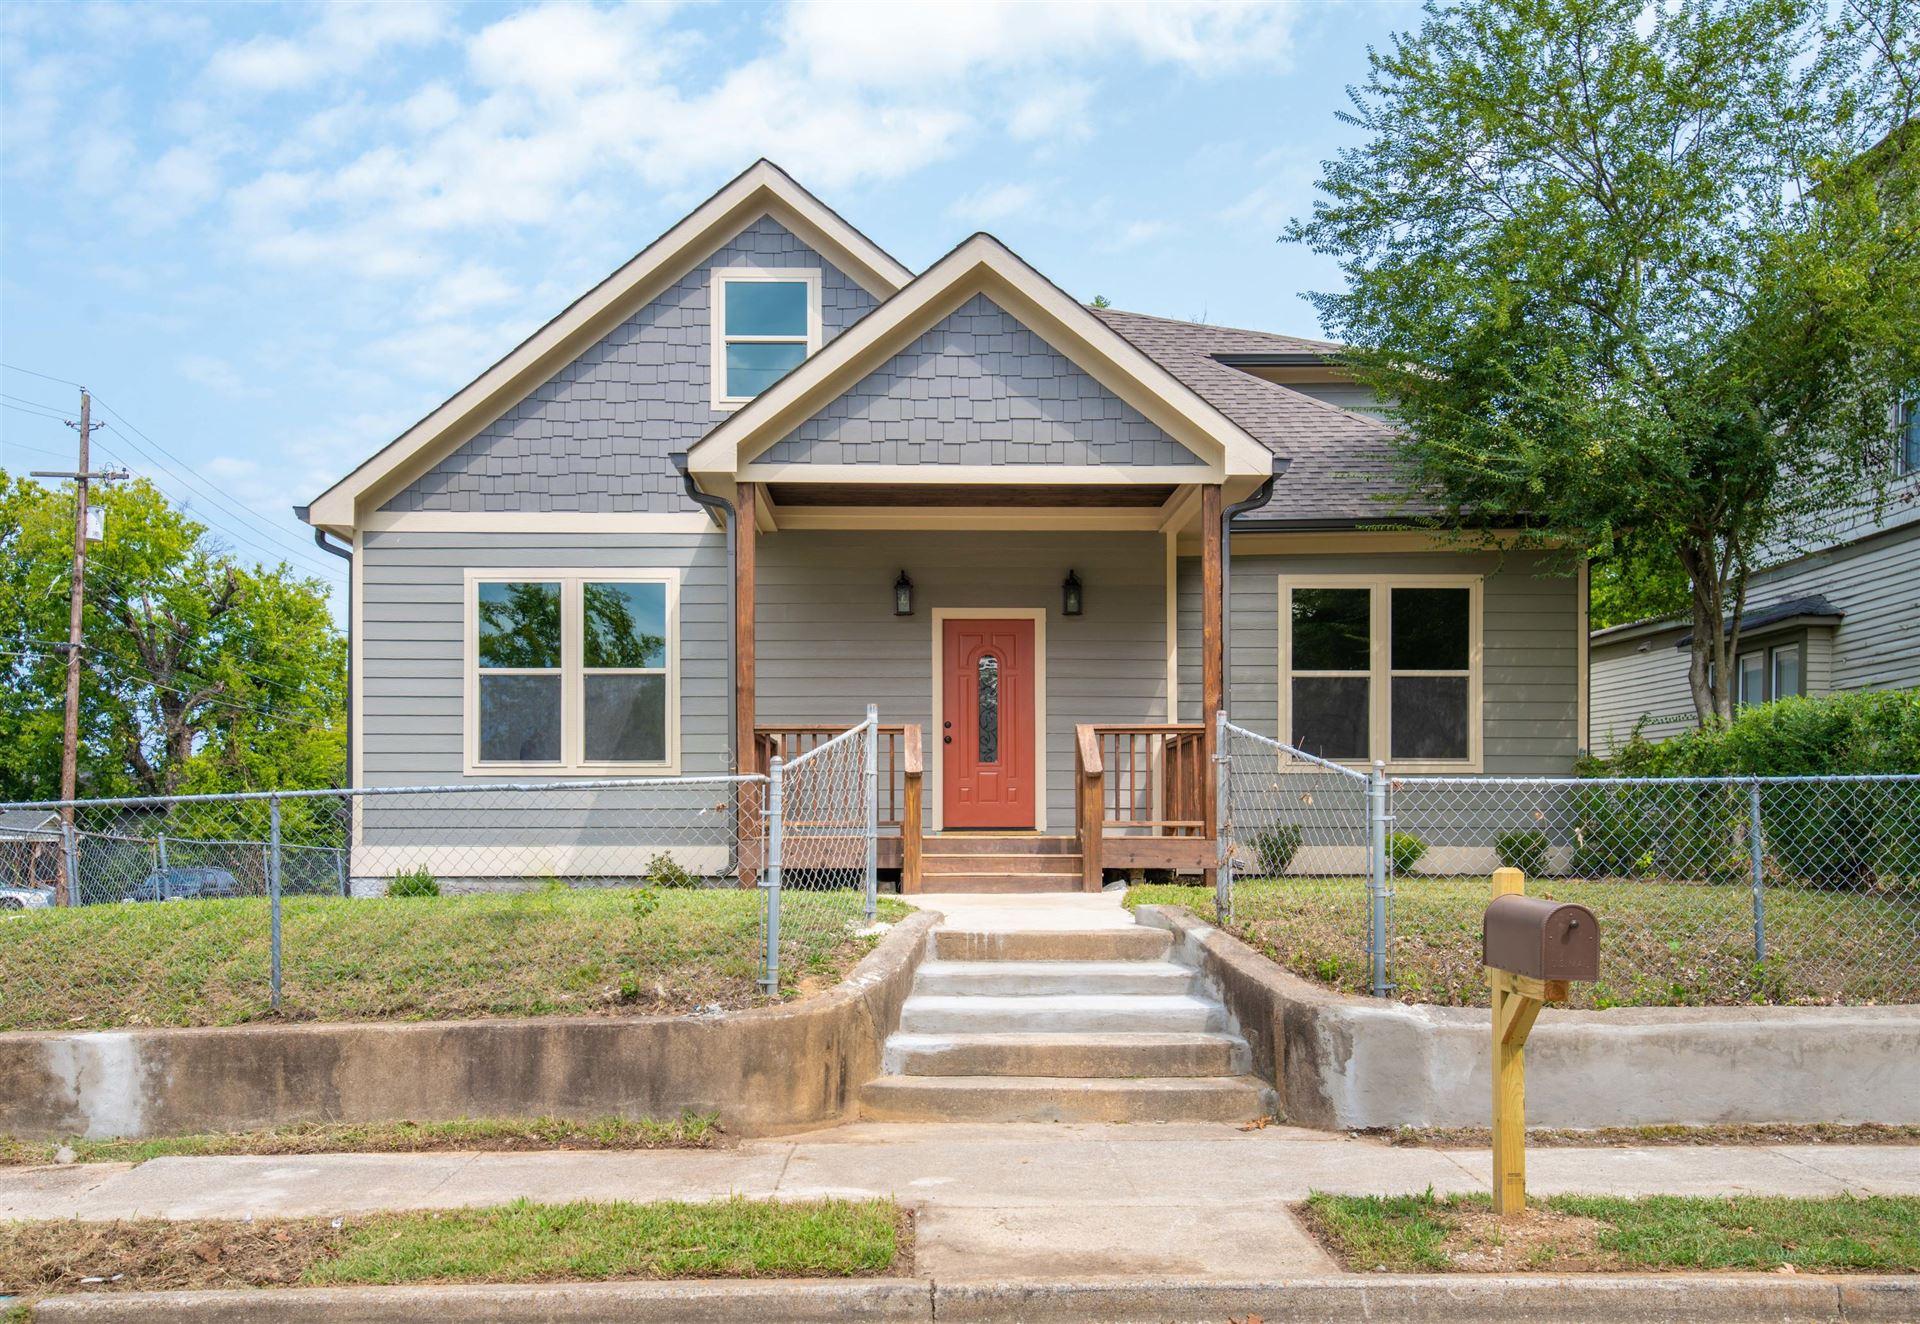 1701 Oak St, Chattanooga, TN 37404 - #: 1324408